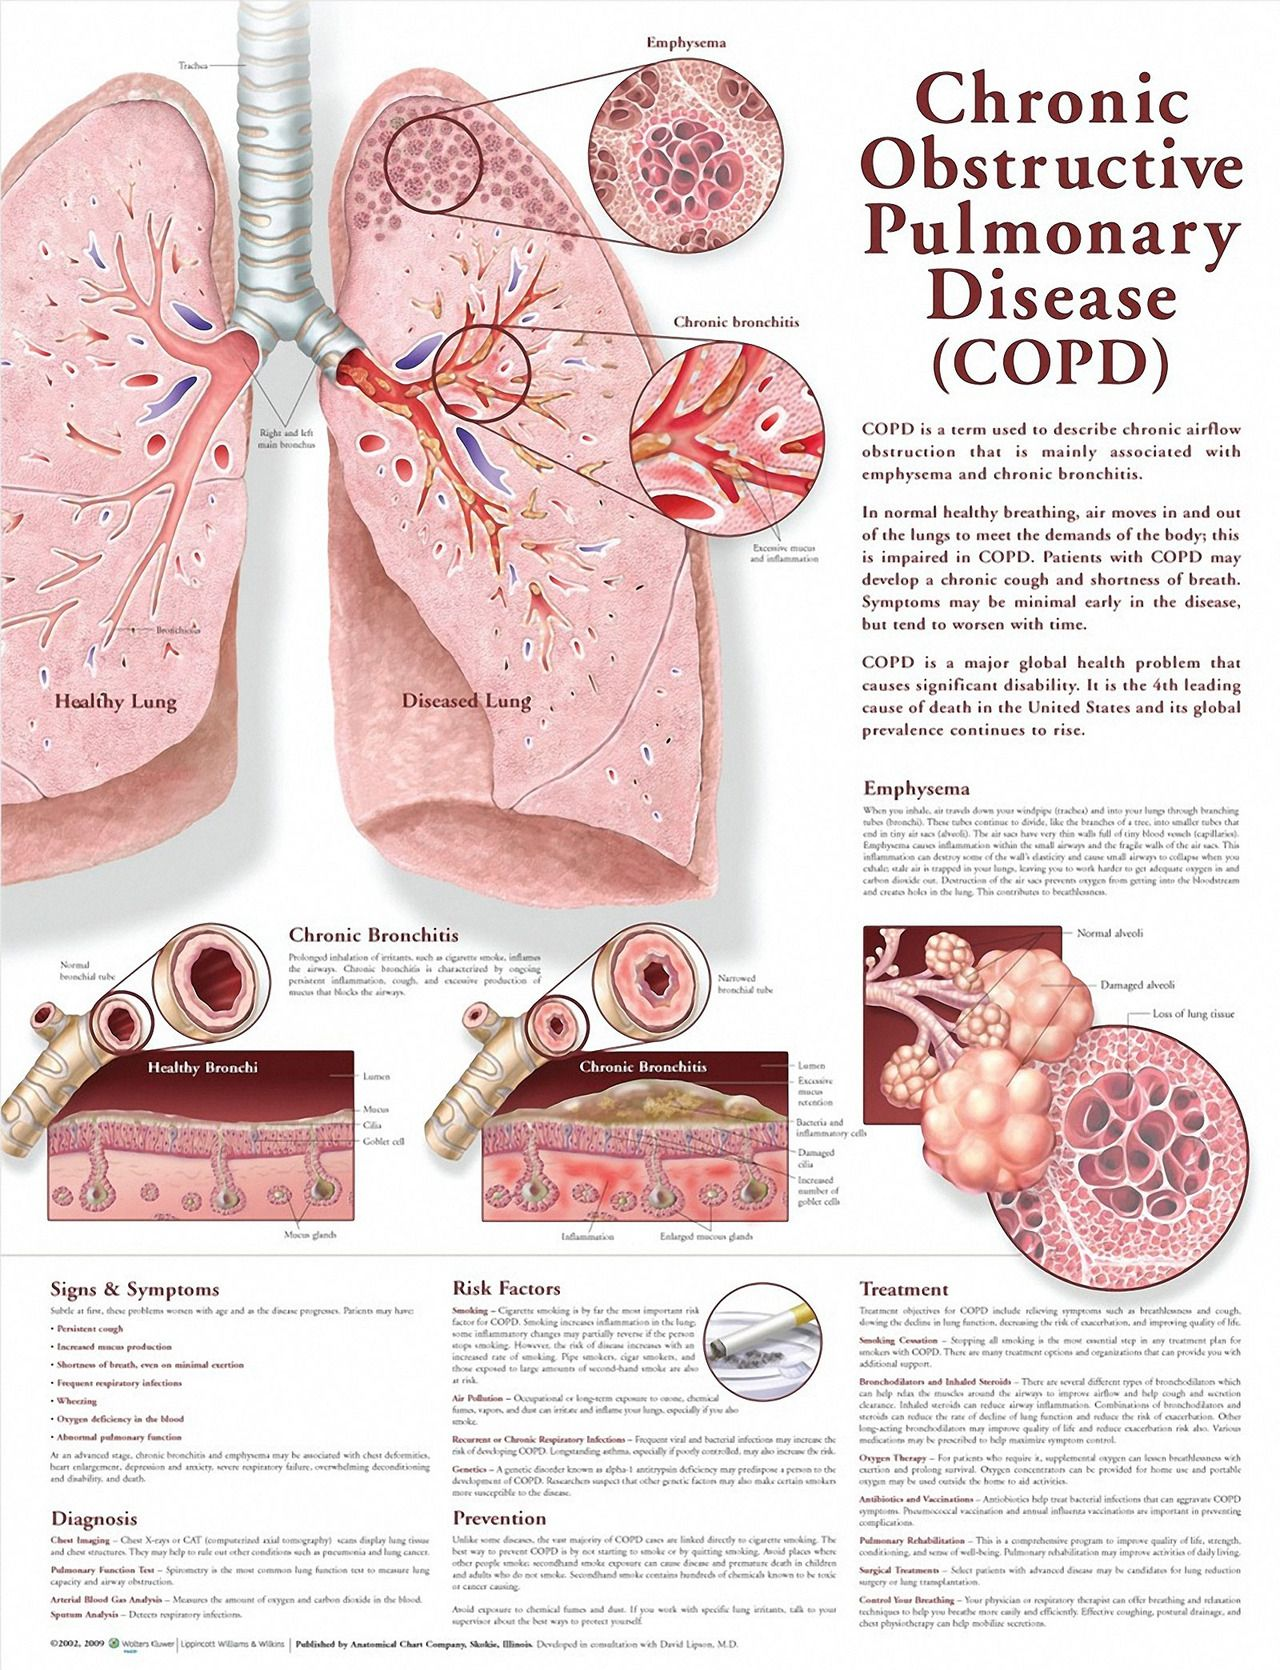 Chronic Obstructive Pulmonary Disease (COPD) Chart   FNP   Pinterest ...